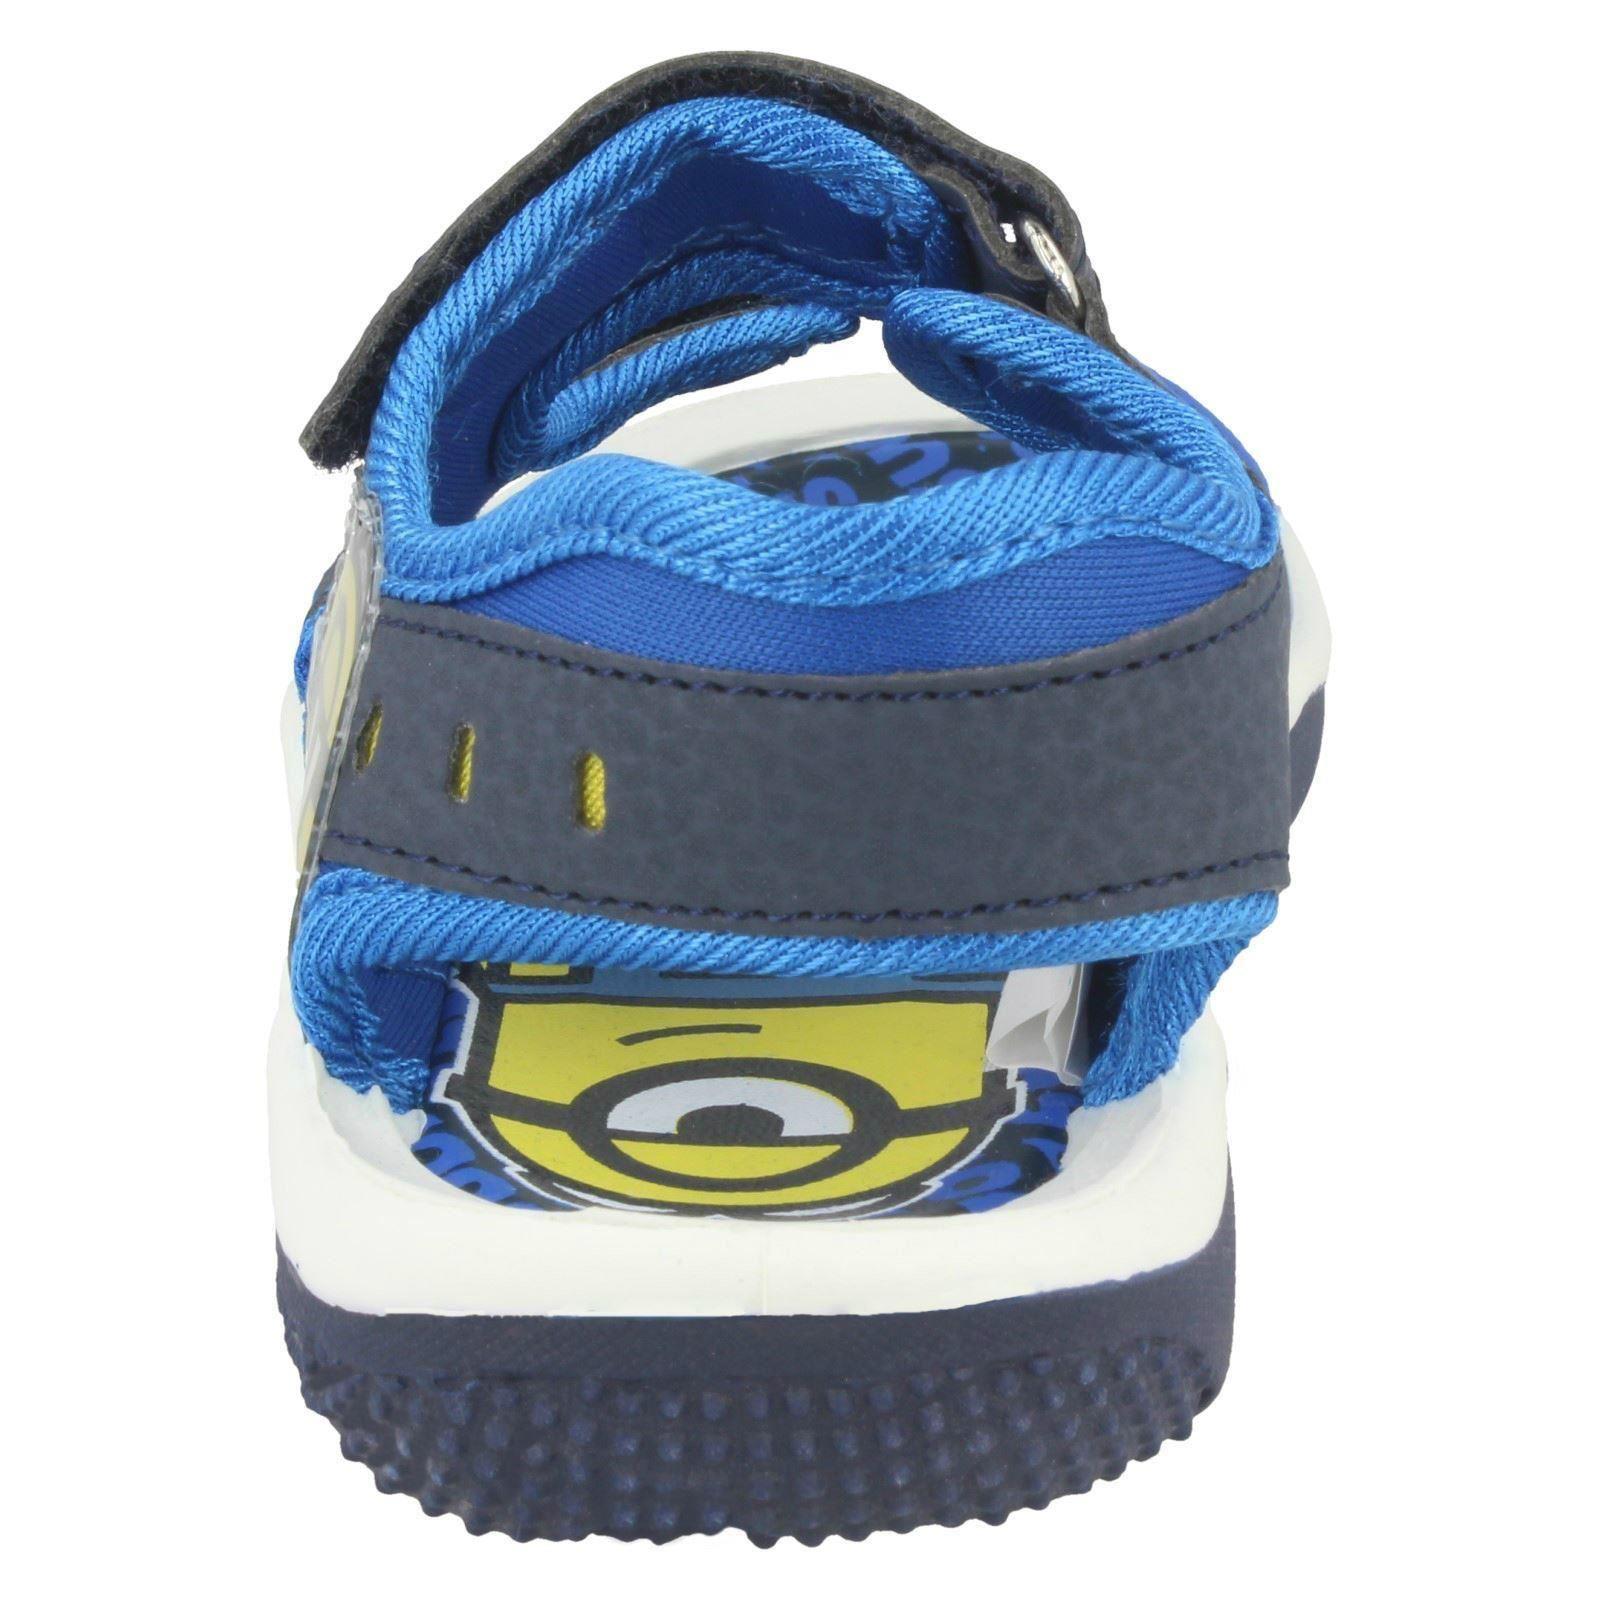 'fraser' Bleu Me' sport Garçon Sandale 'Despicable wIUqnY